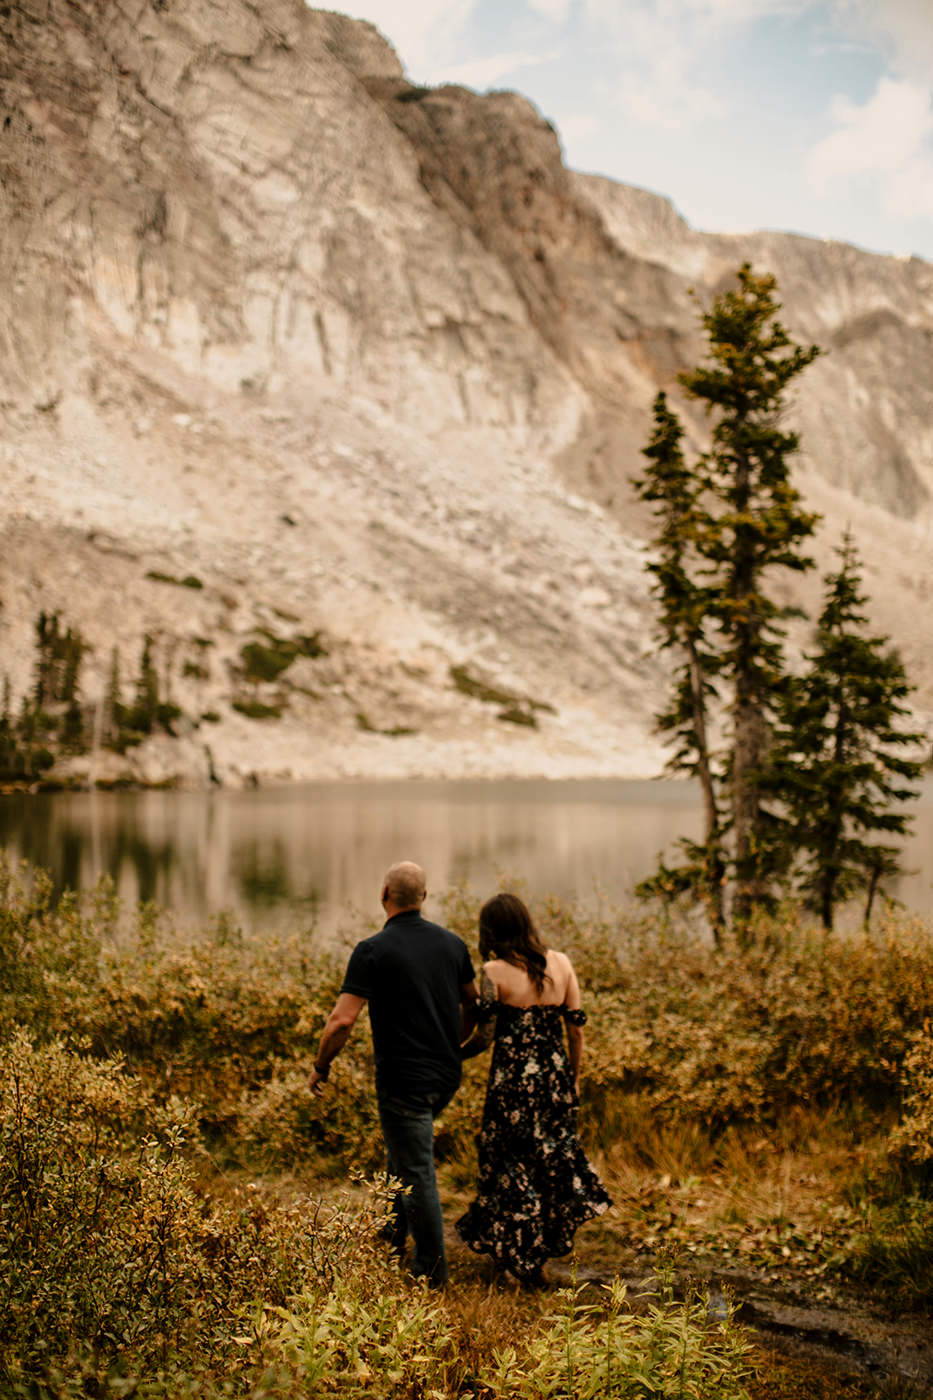 http://www.lizosbanphotography.com/weddings-1/